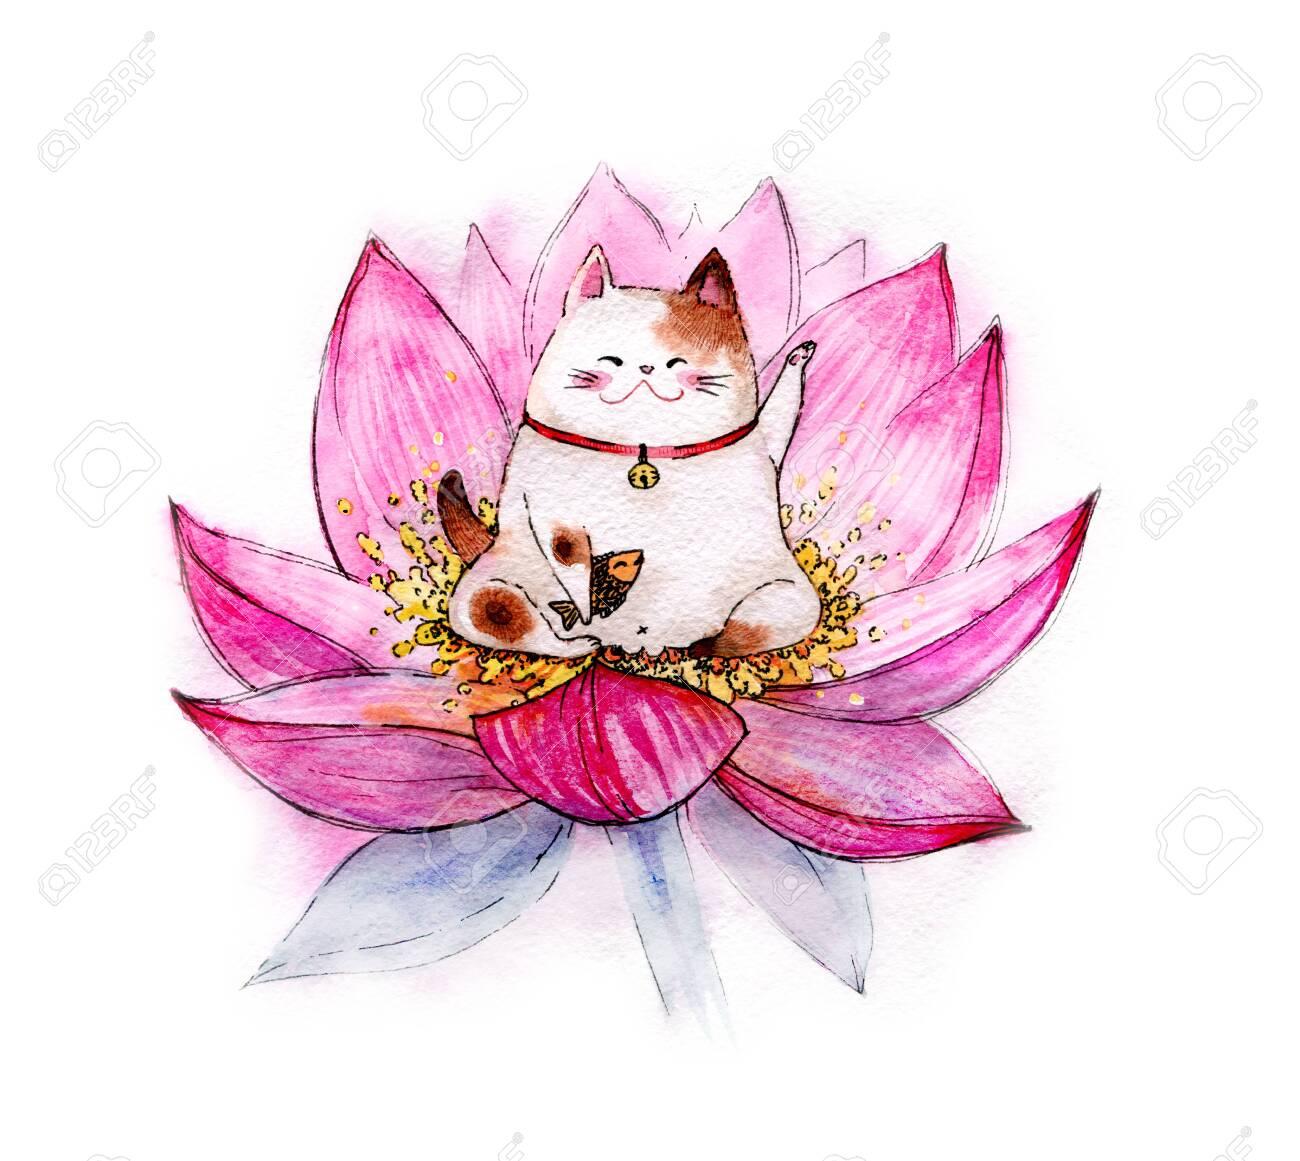 Cute Kawaii Cartoon Maneki Cat Neko Meditating In Lotus Flower Stock Photo Picture And Royalty Free Image Image 136553362